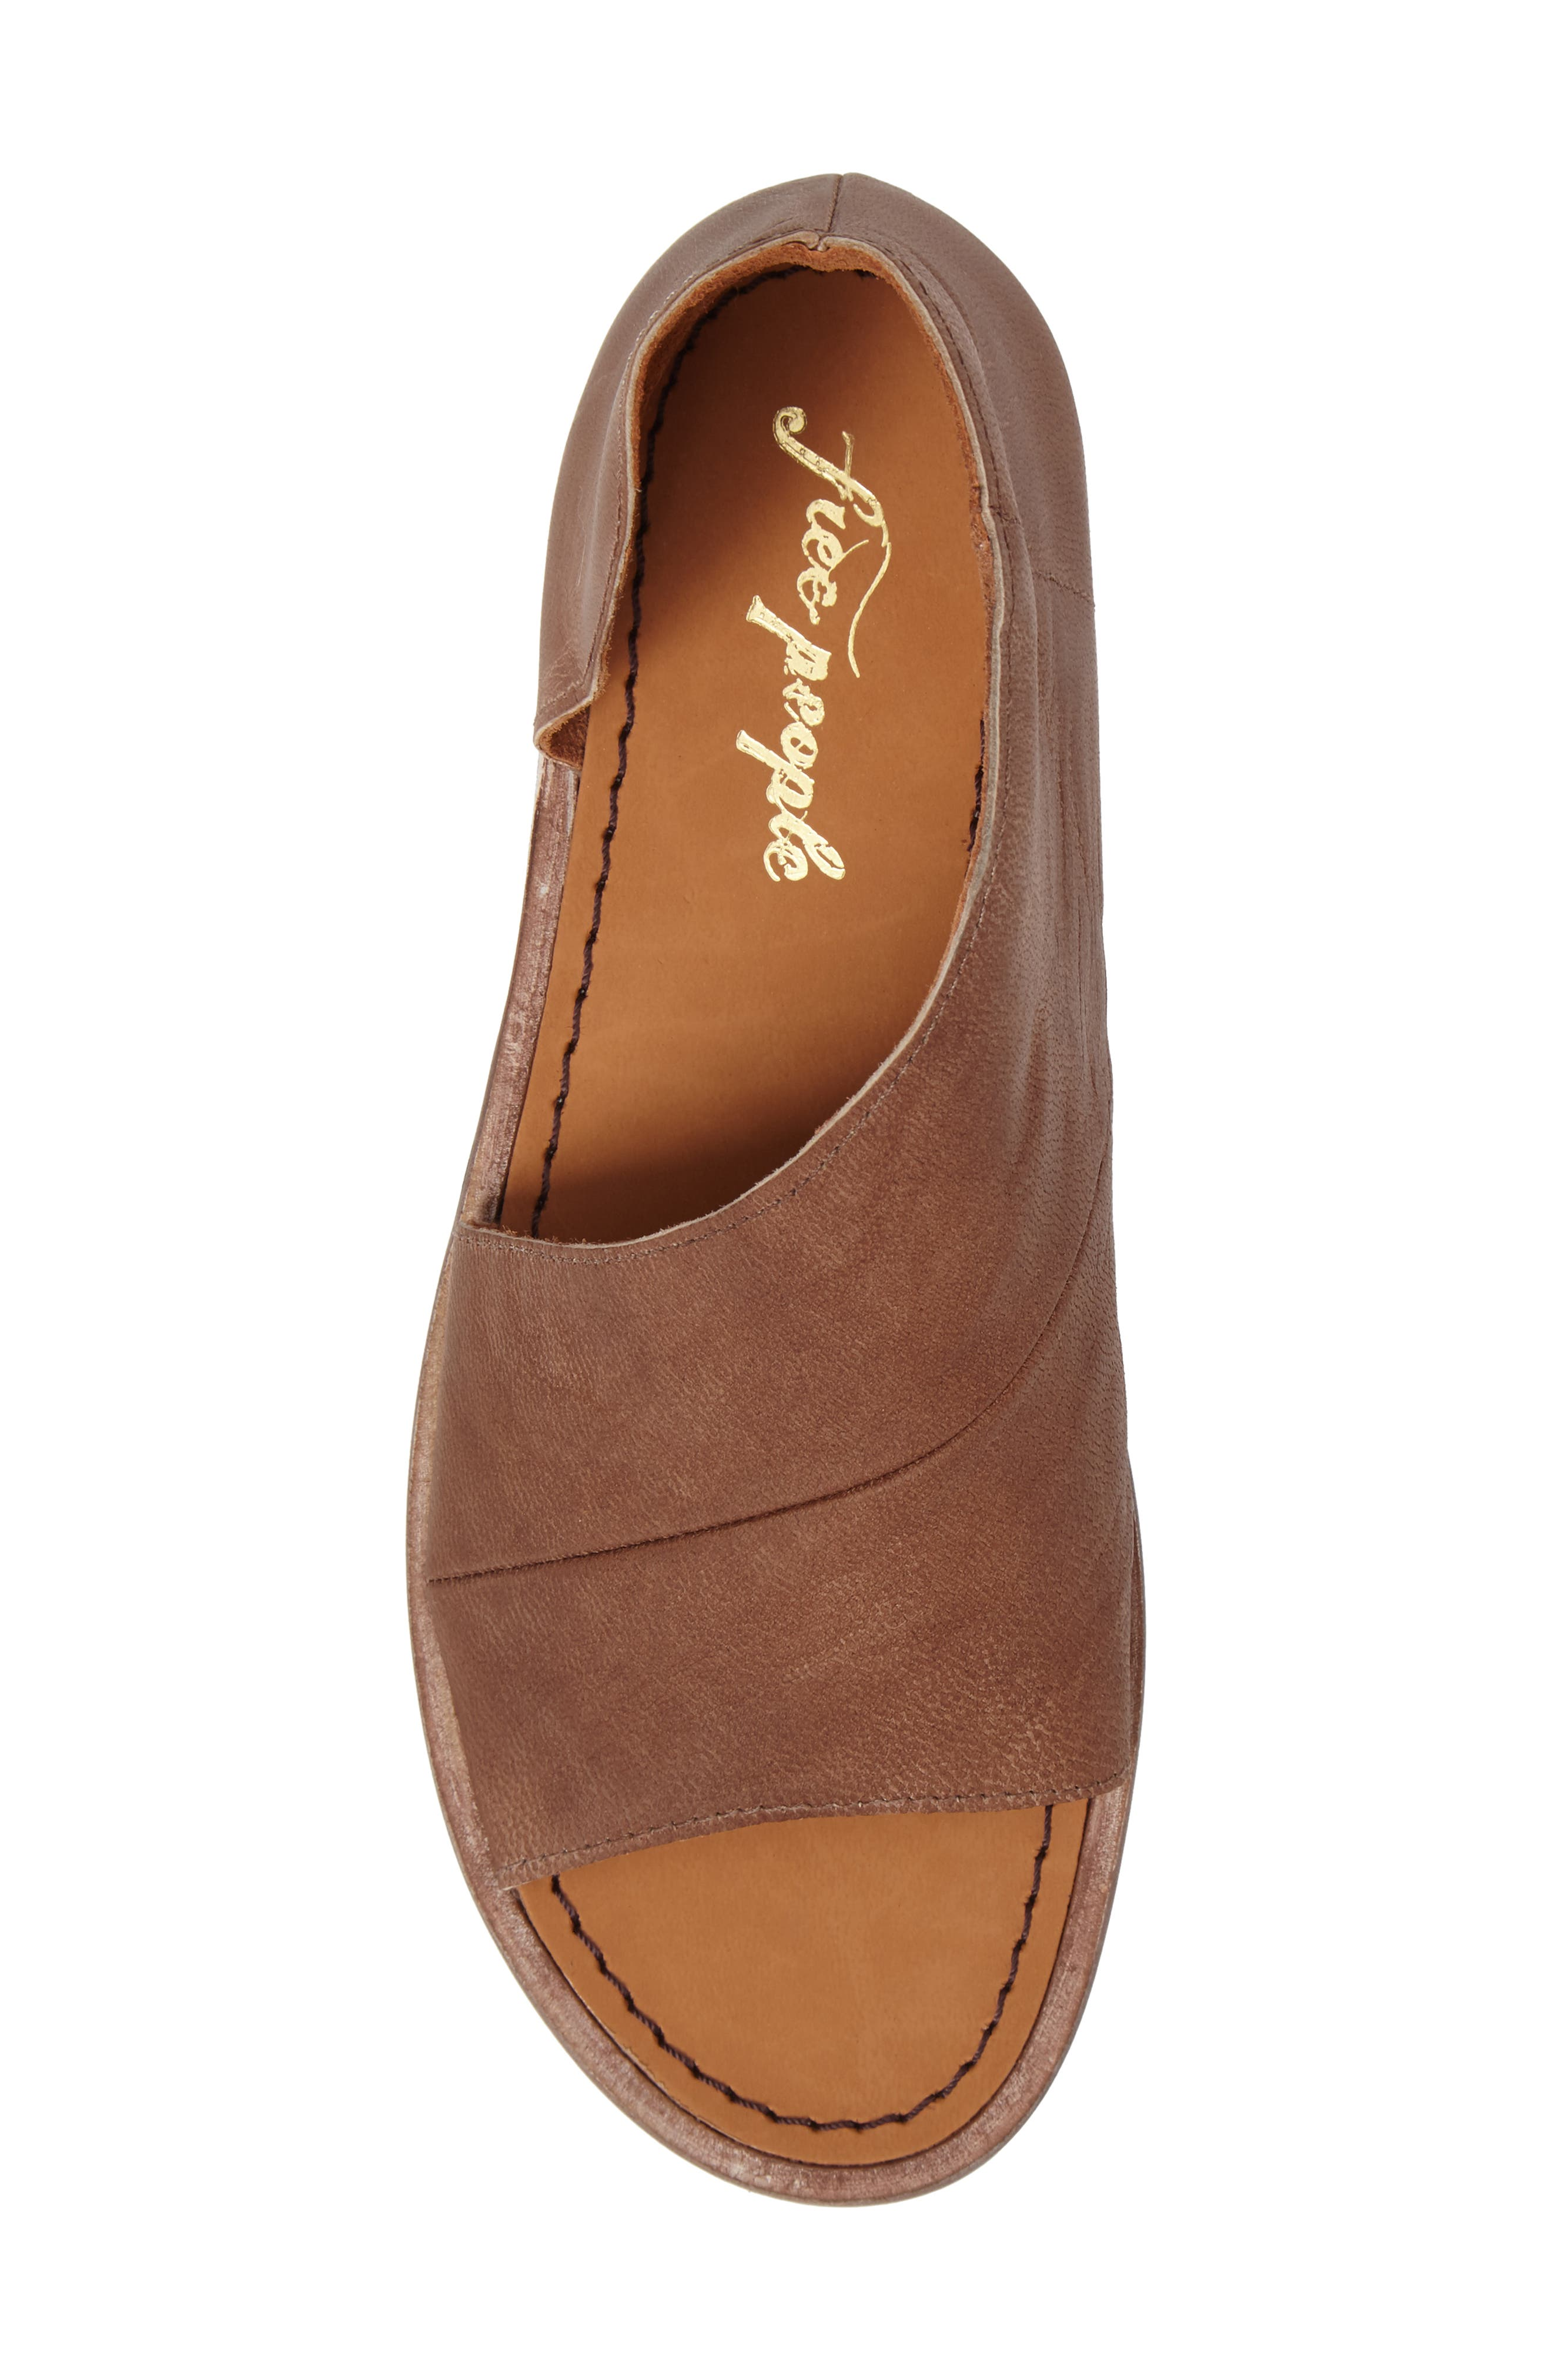 'Mont Blanc' Asymmetrical Sandal,                             Alternate thumbnail 62, color,